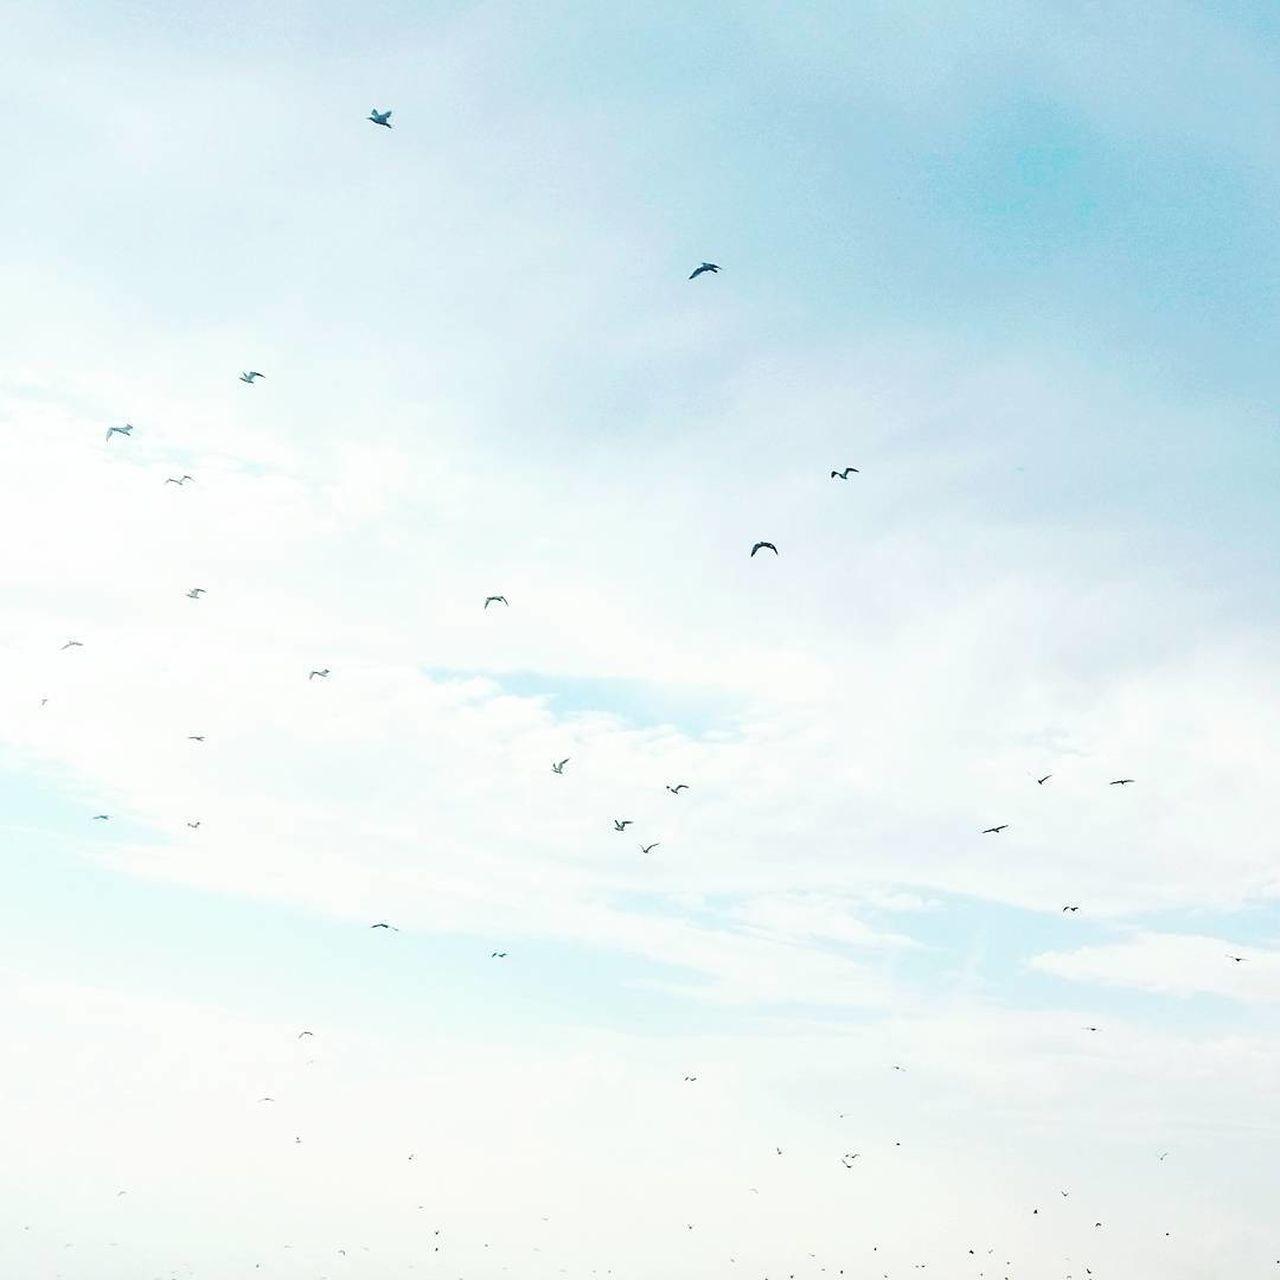 Bird Birds Day Flock Of Birds Flying Migrating Nature No People Outdoors Sky Spread Wings